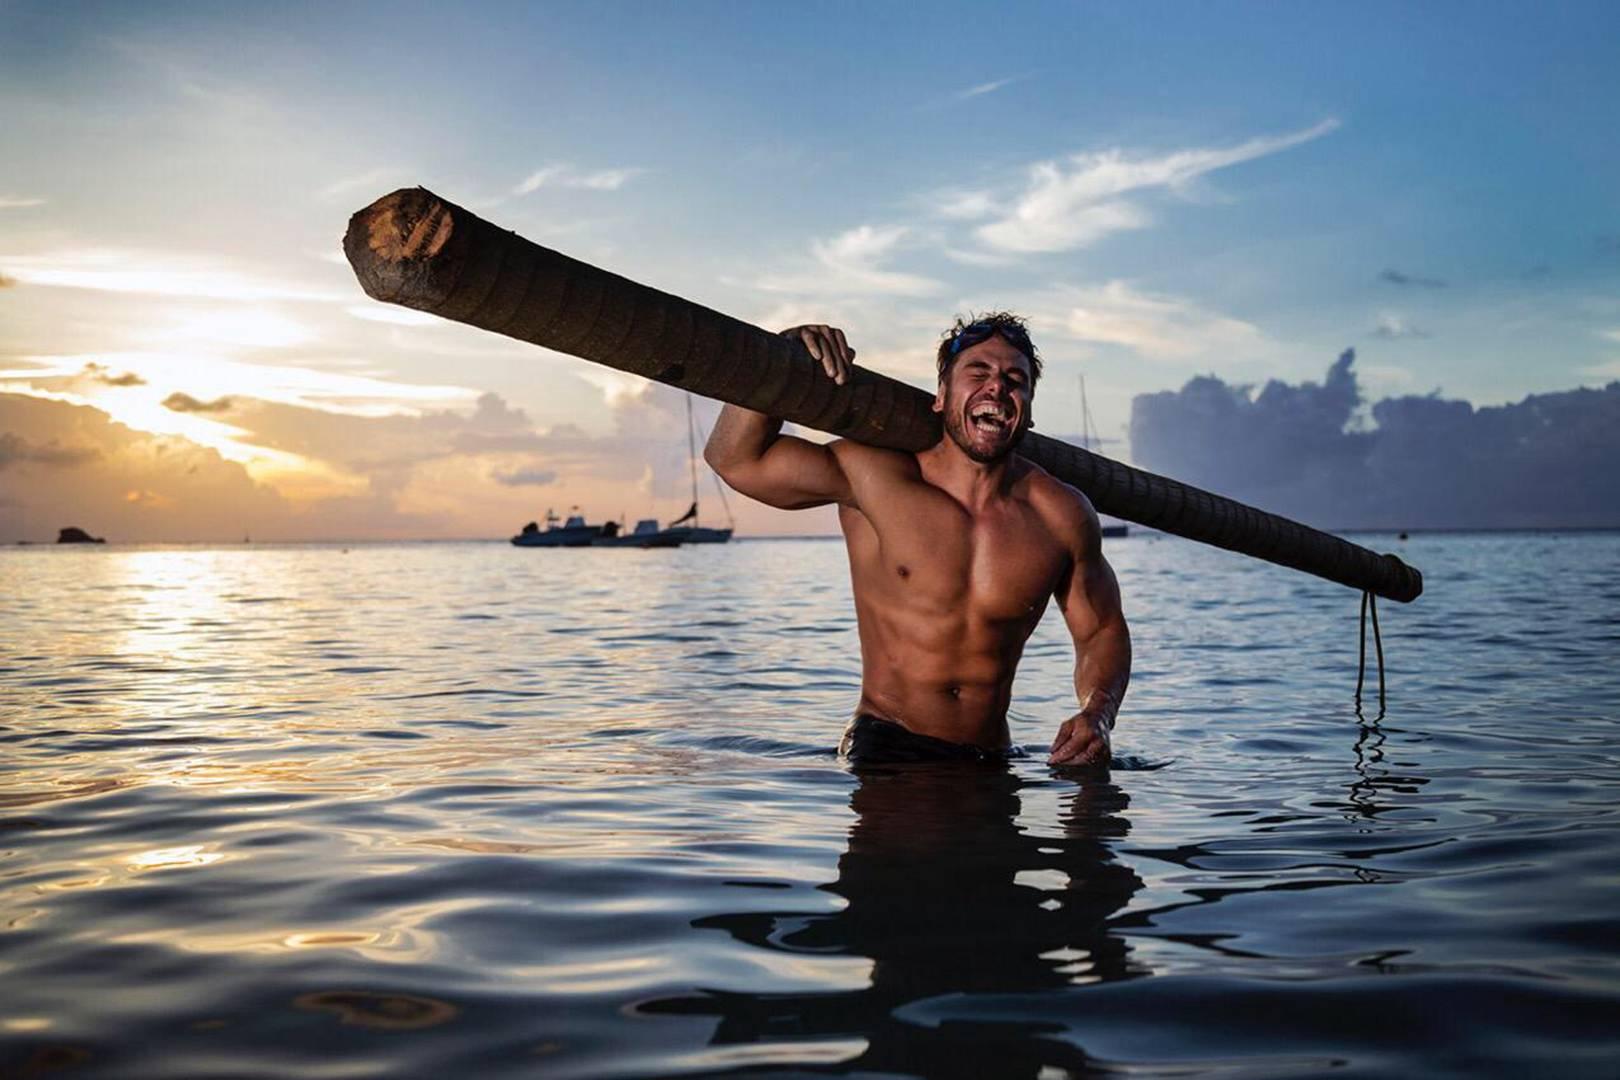 fdf3fe9cd5 The secrets of strongman swimming | British GQ